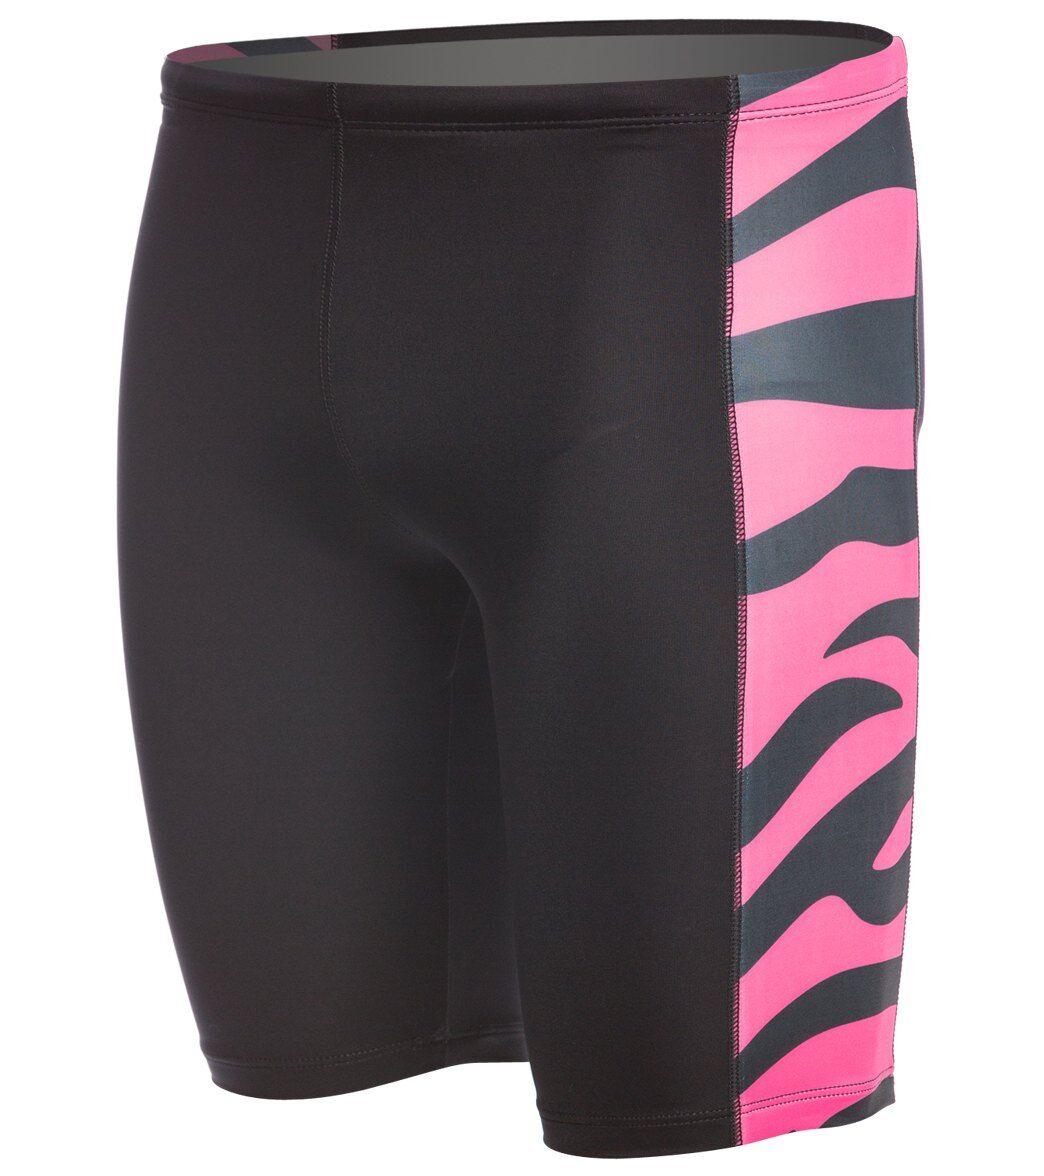 Splish Tiger Jammer Swimsuit - Pink 24 Lycra®/Nylon/Spandex - Swimoutlet.com